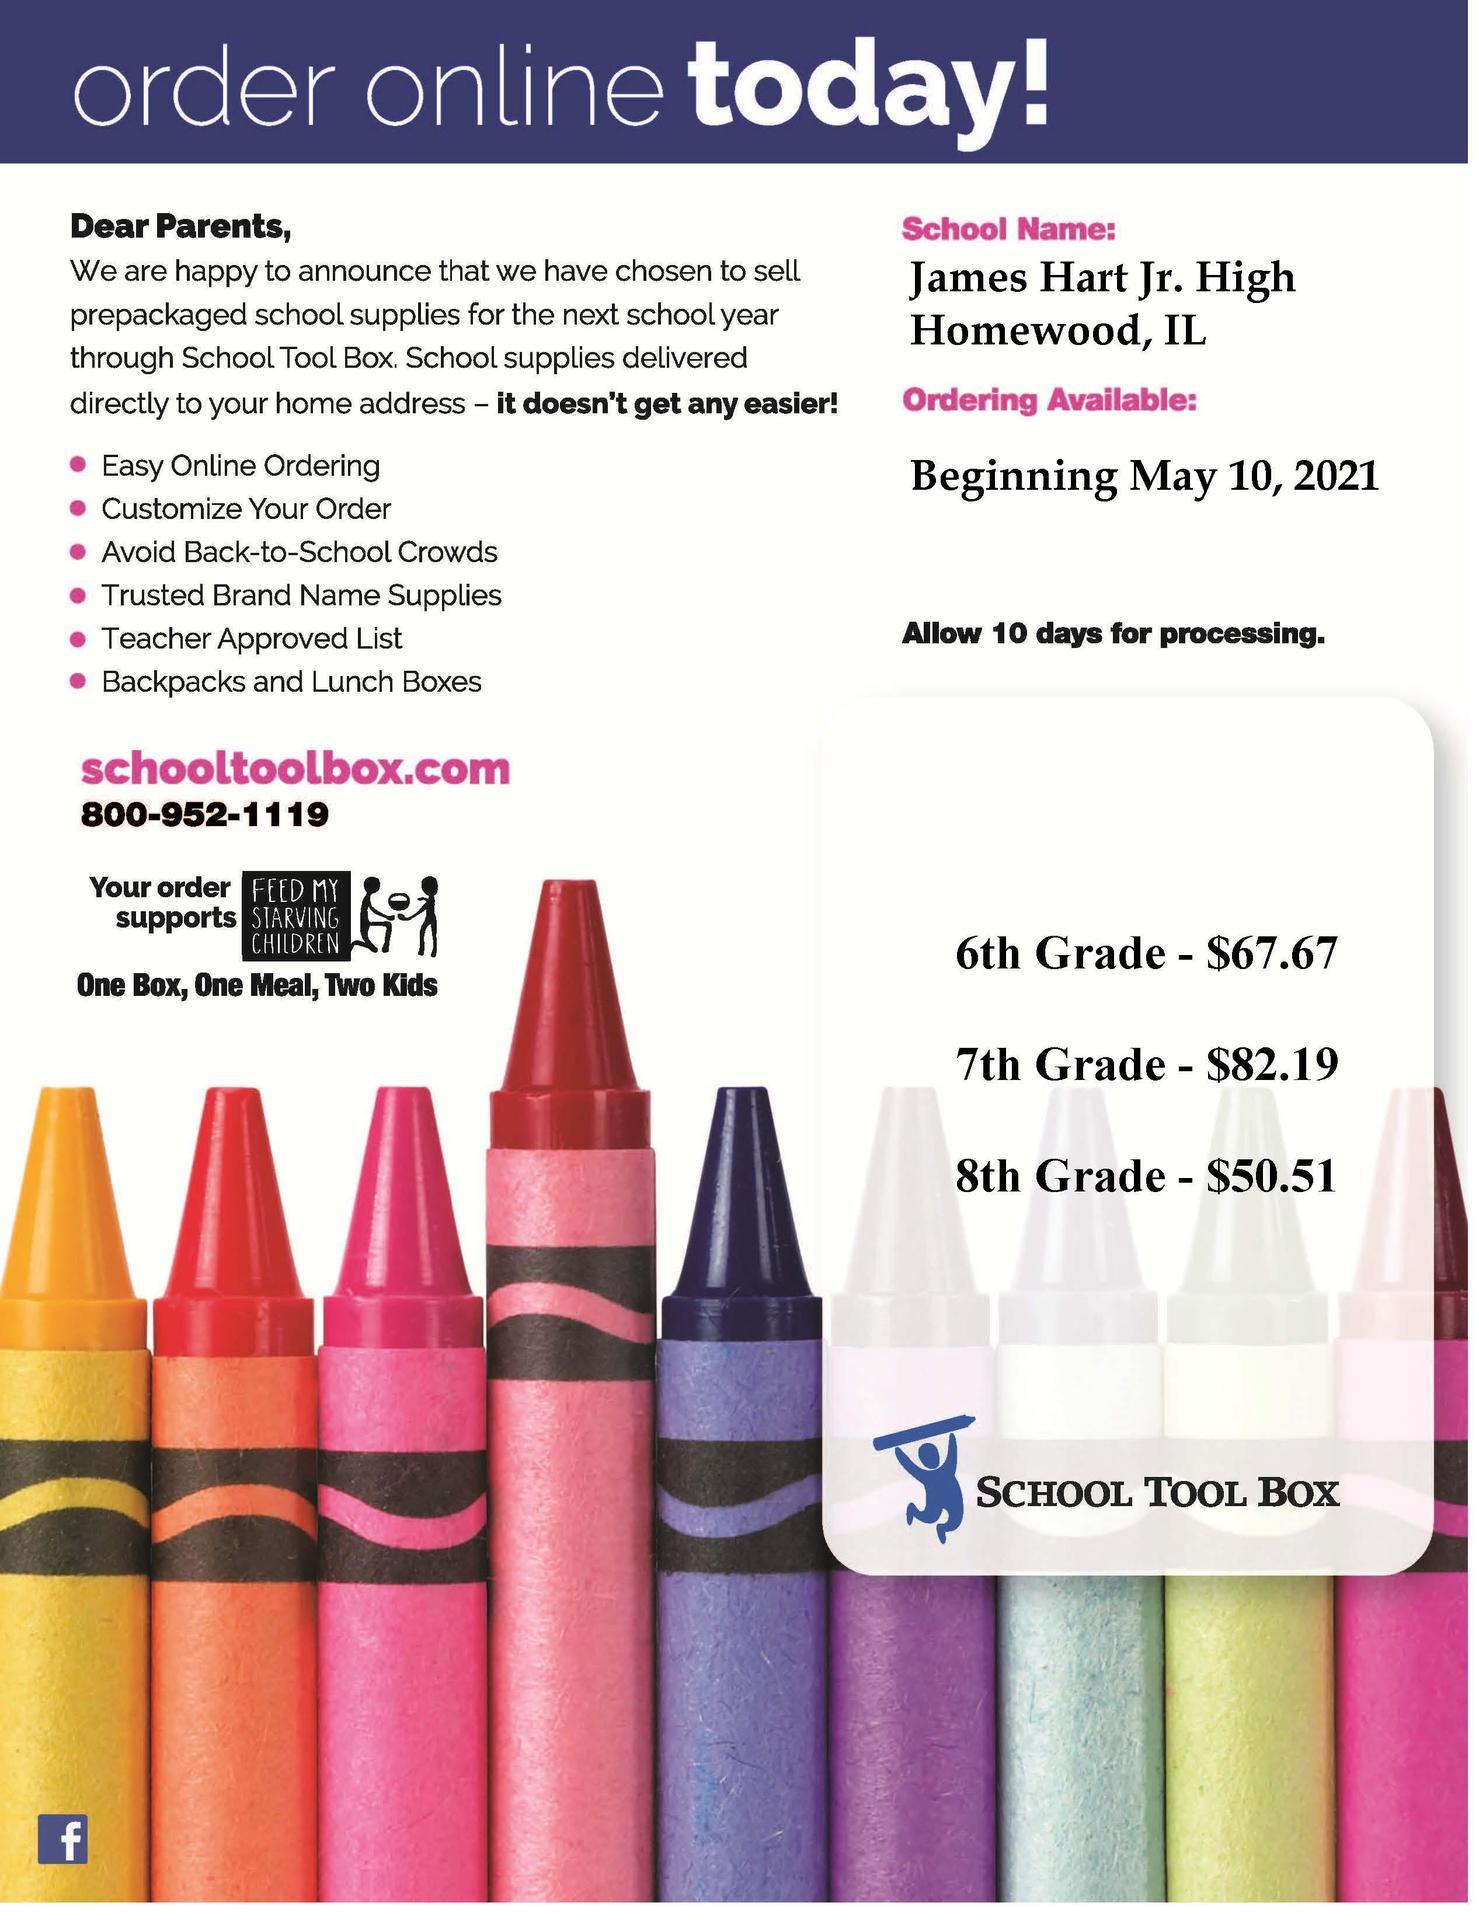 James Hart school supply kit